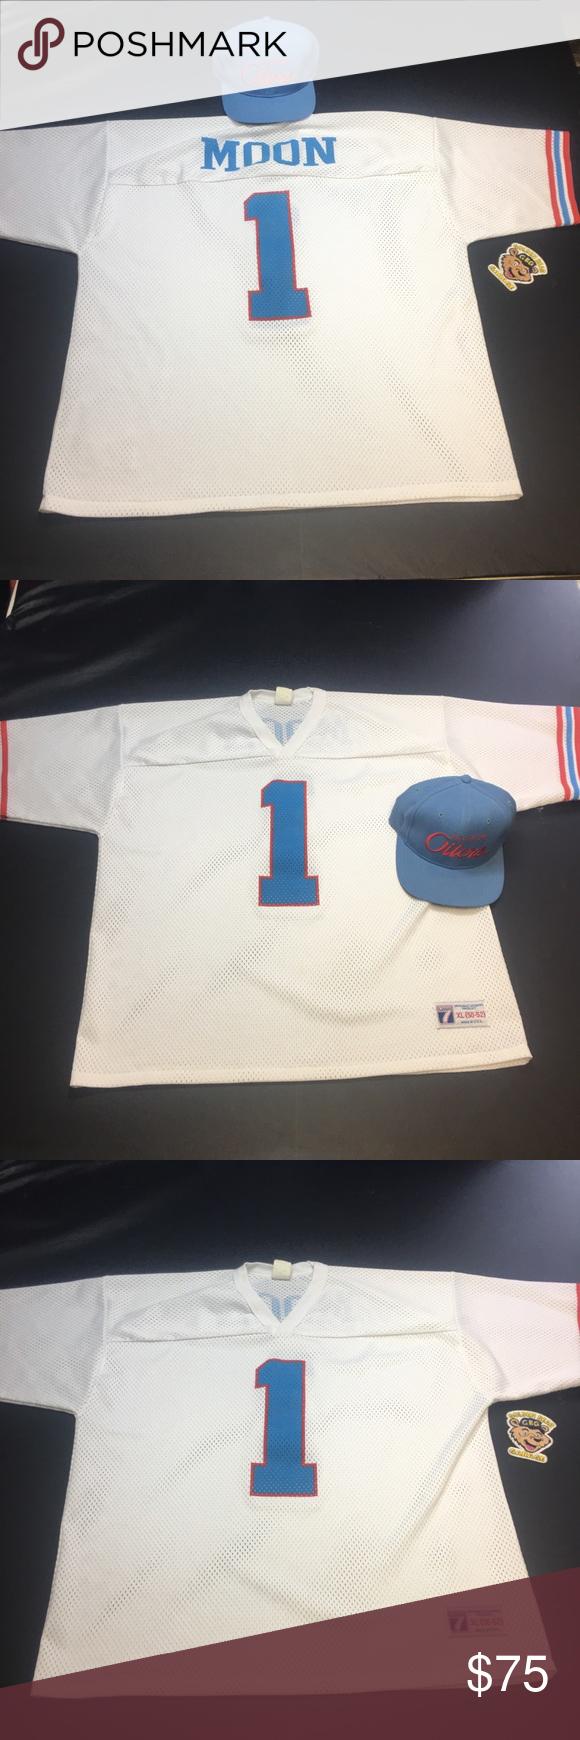 online store 440aa 0a3c3 Vintage Houston Oilers Warren Moon Football Jersey Vintage ...